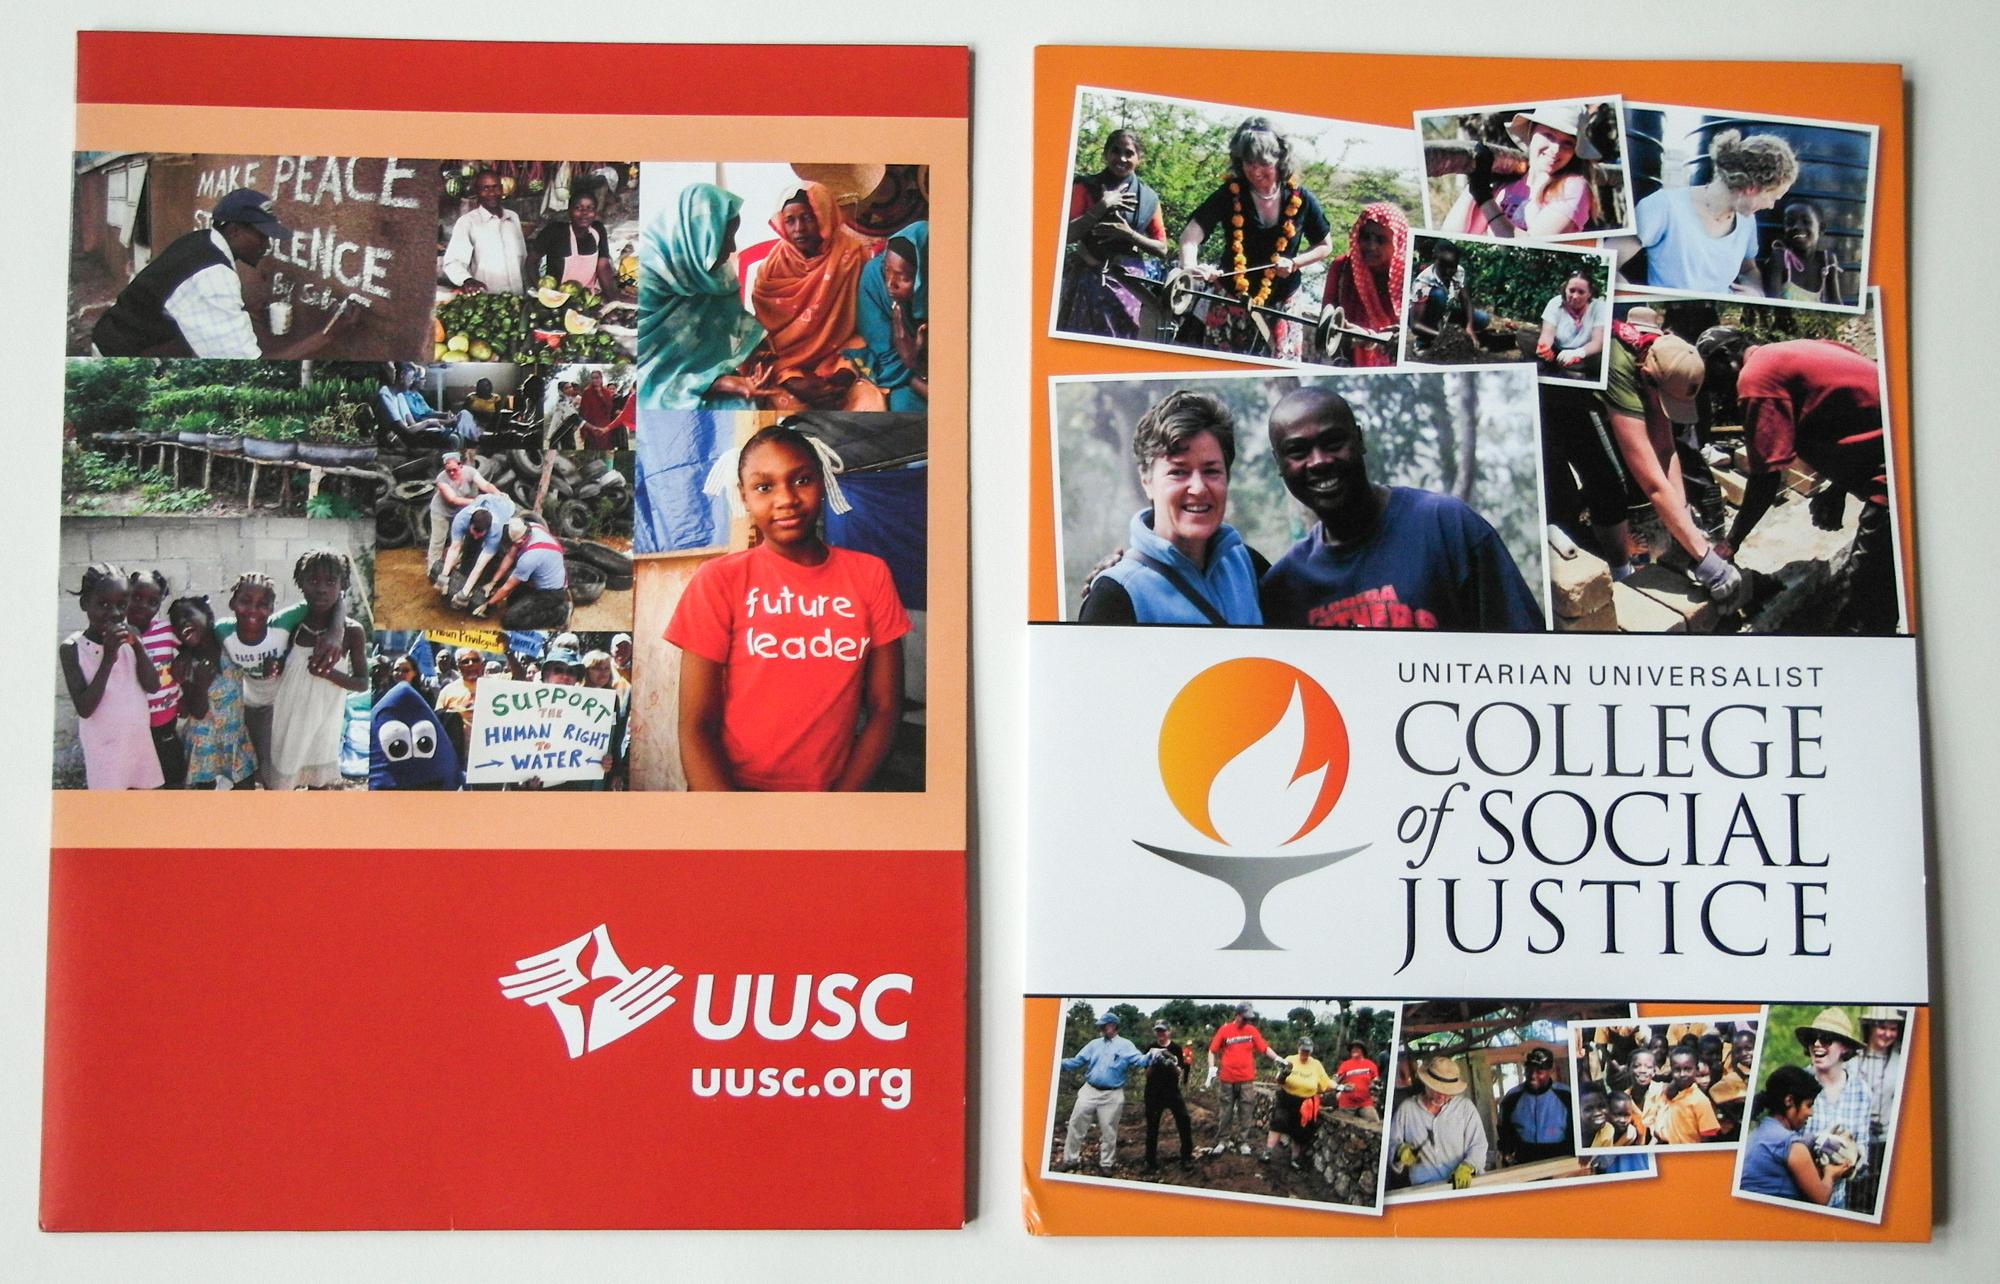 UUSC and UUCSJ pocket folders 2013-2015